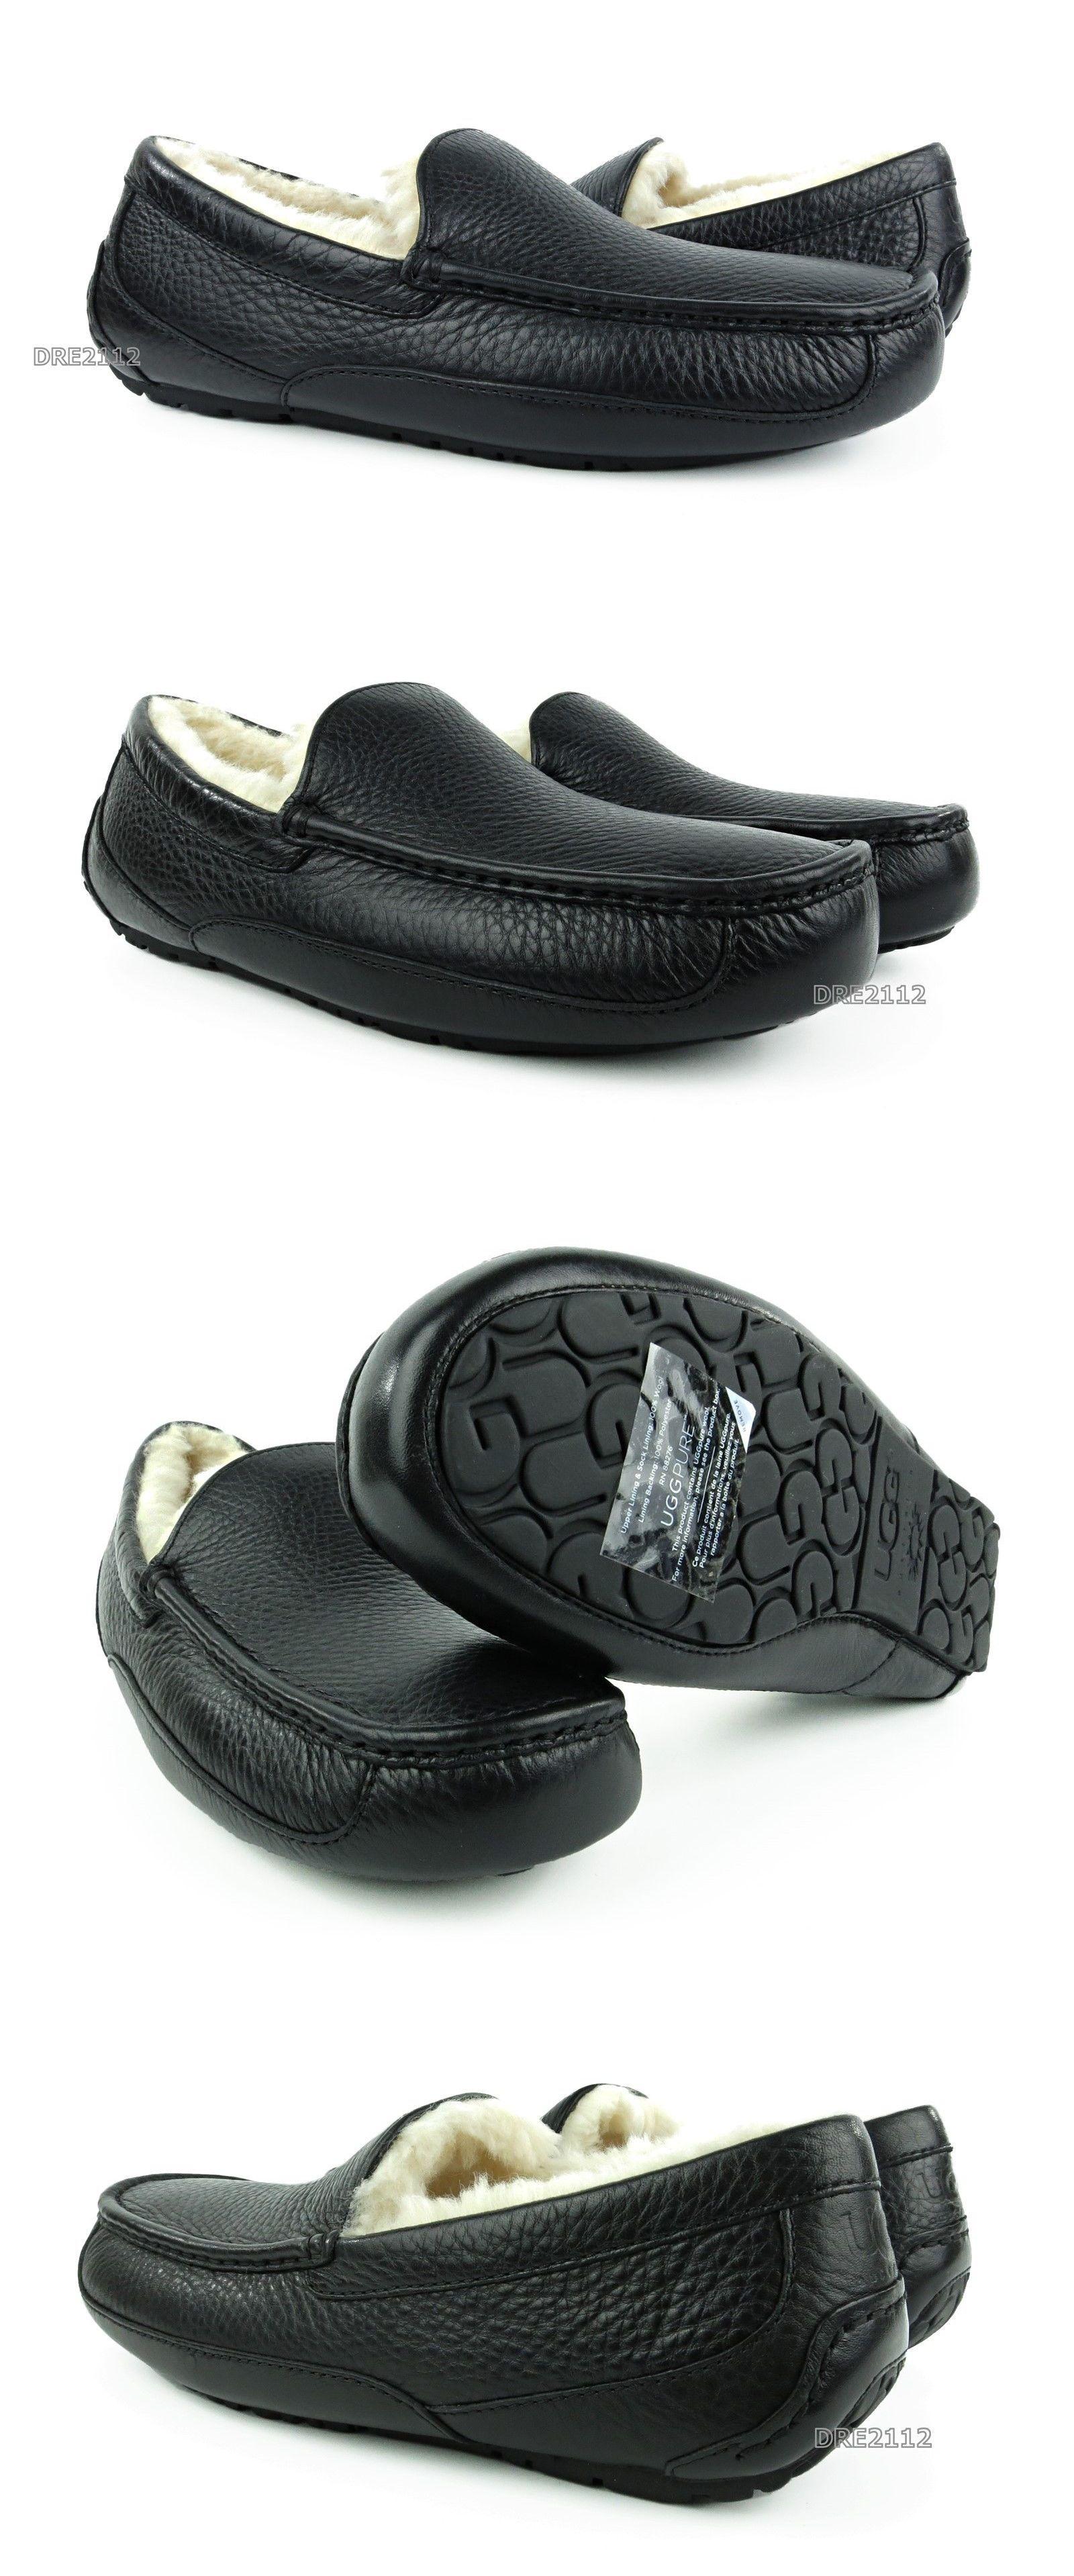 4b2fe347b76 Slippers 11505: Ugg Australia Ascot Black Leather Fur Slippers Mens ...